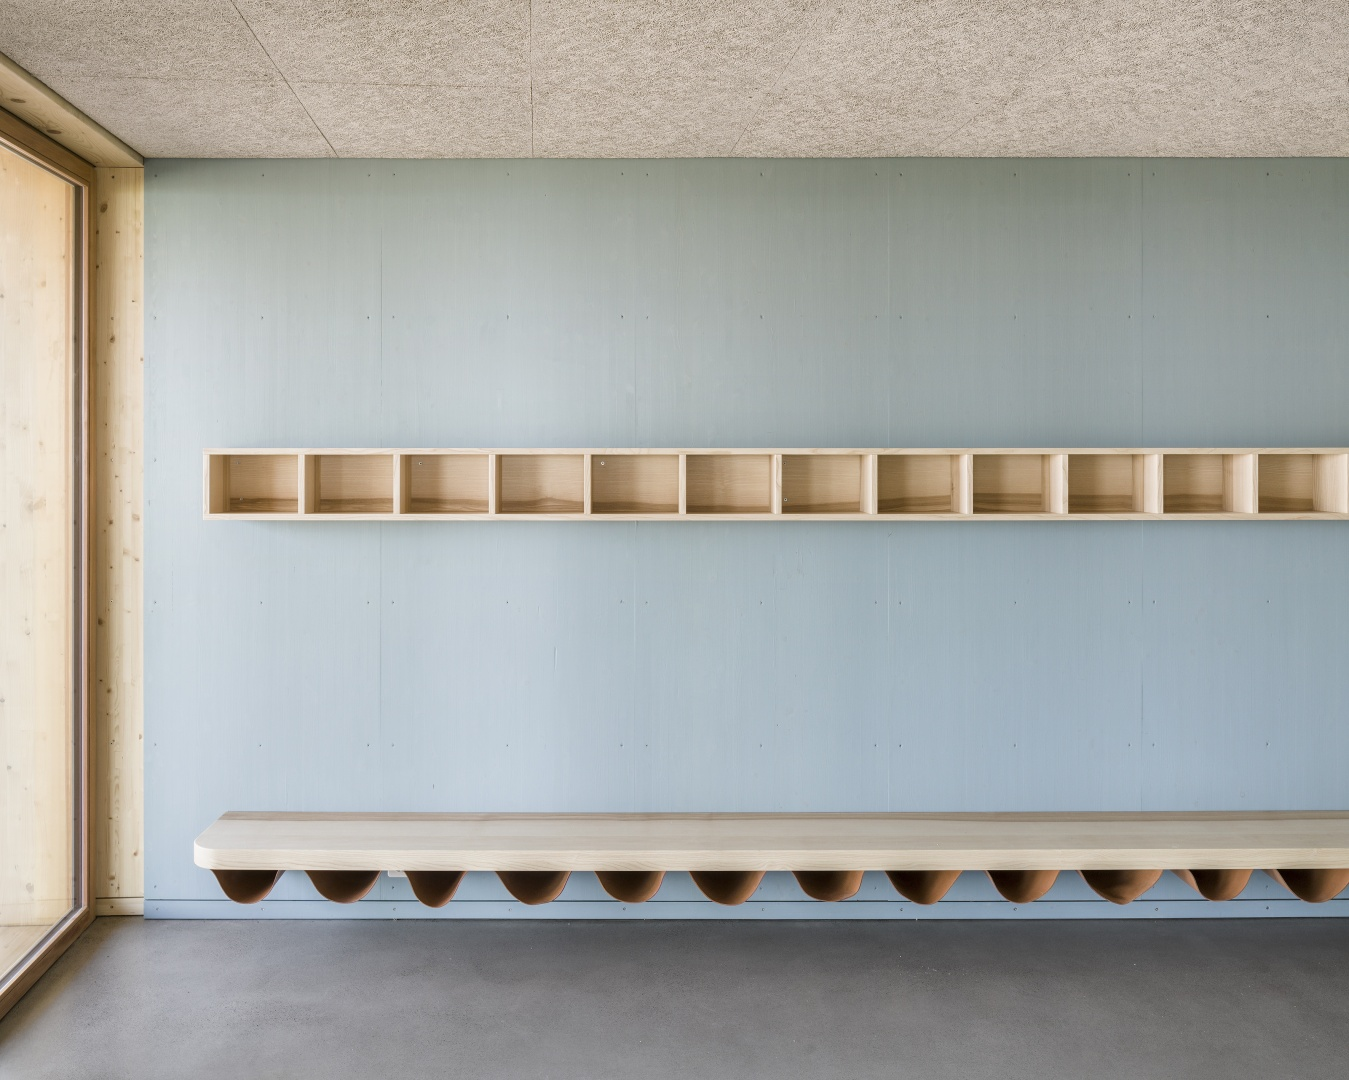 Garderobe © 2017 Jaeger Koechlin Achitekten, Basel